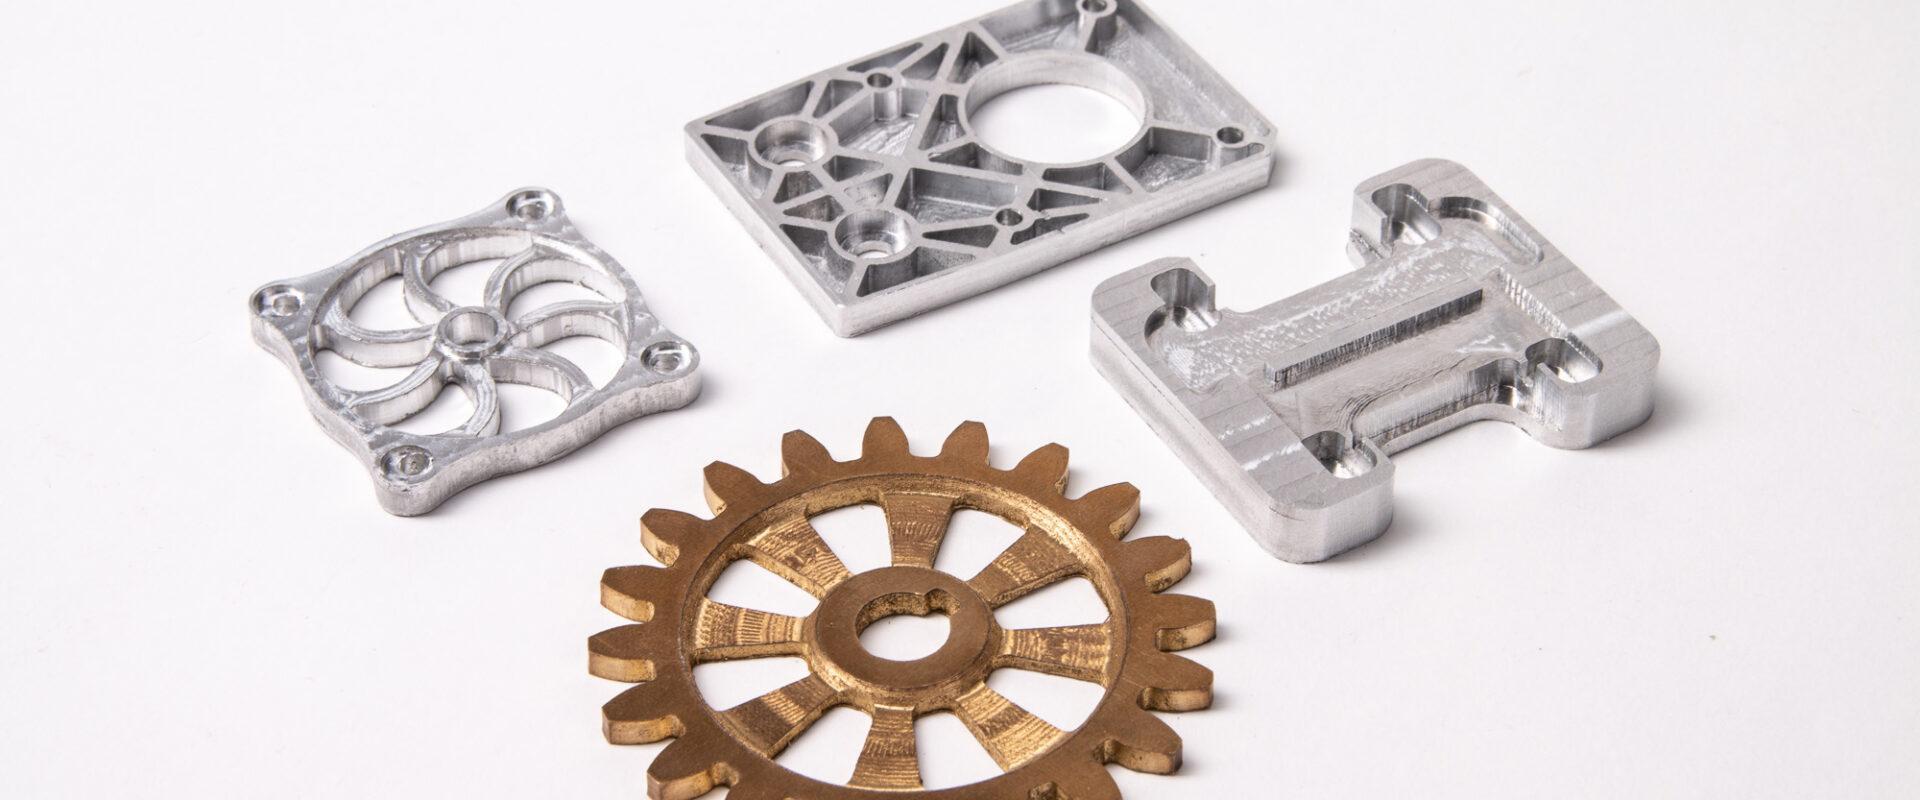 cnc milling in metals